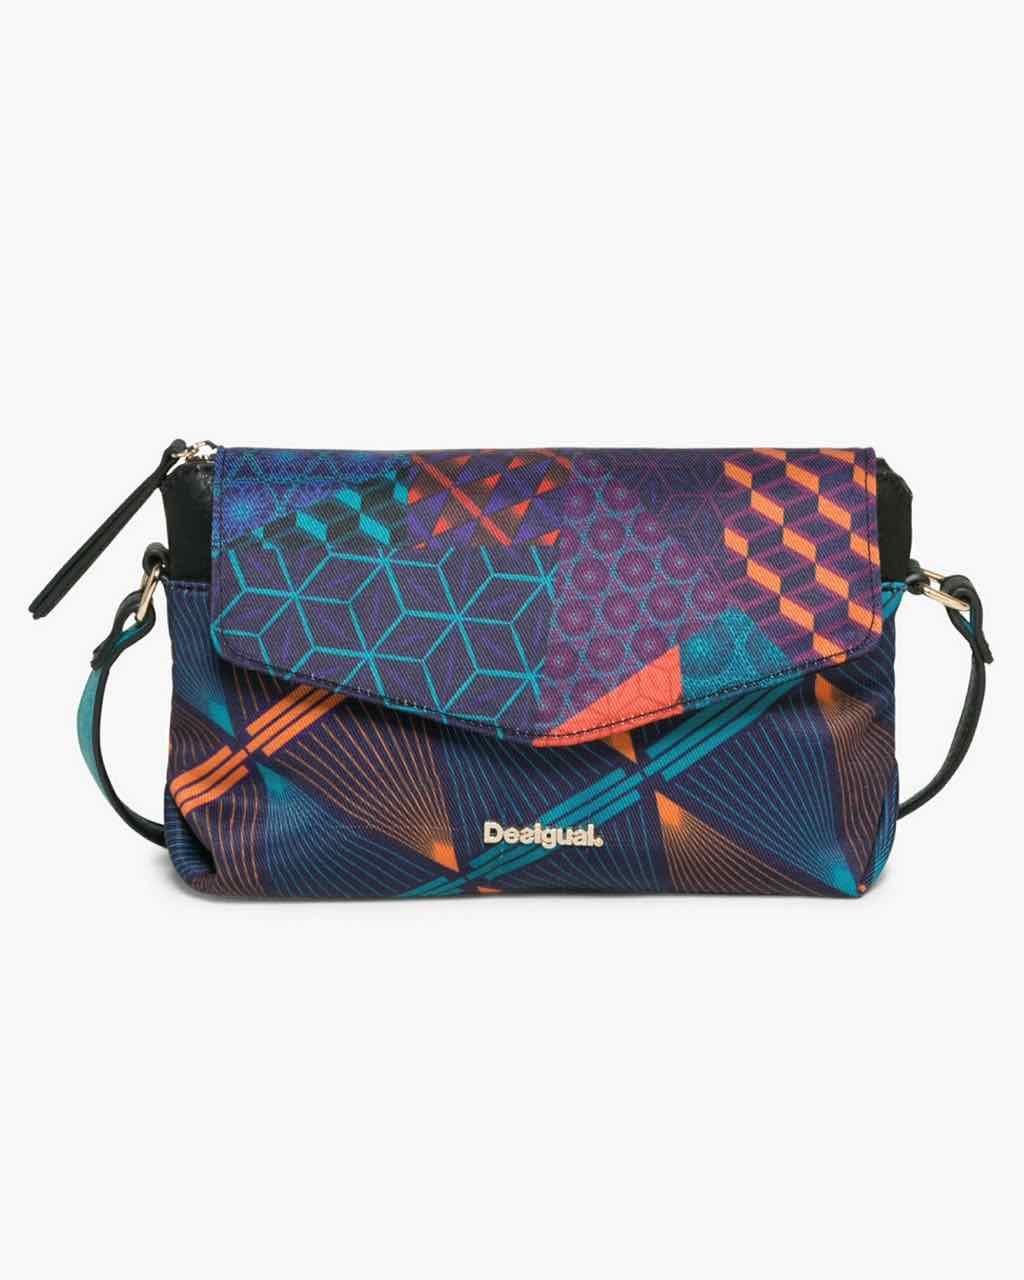 17WAXPTM_3094 Desigual Bag Bilbao Erika Buy Online